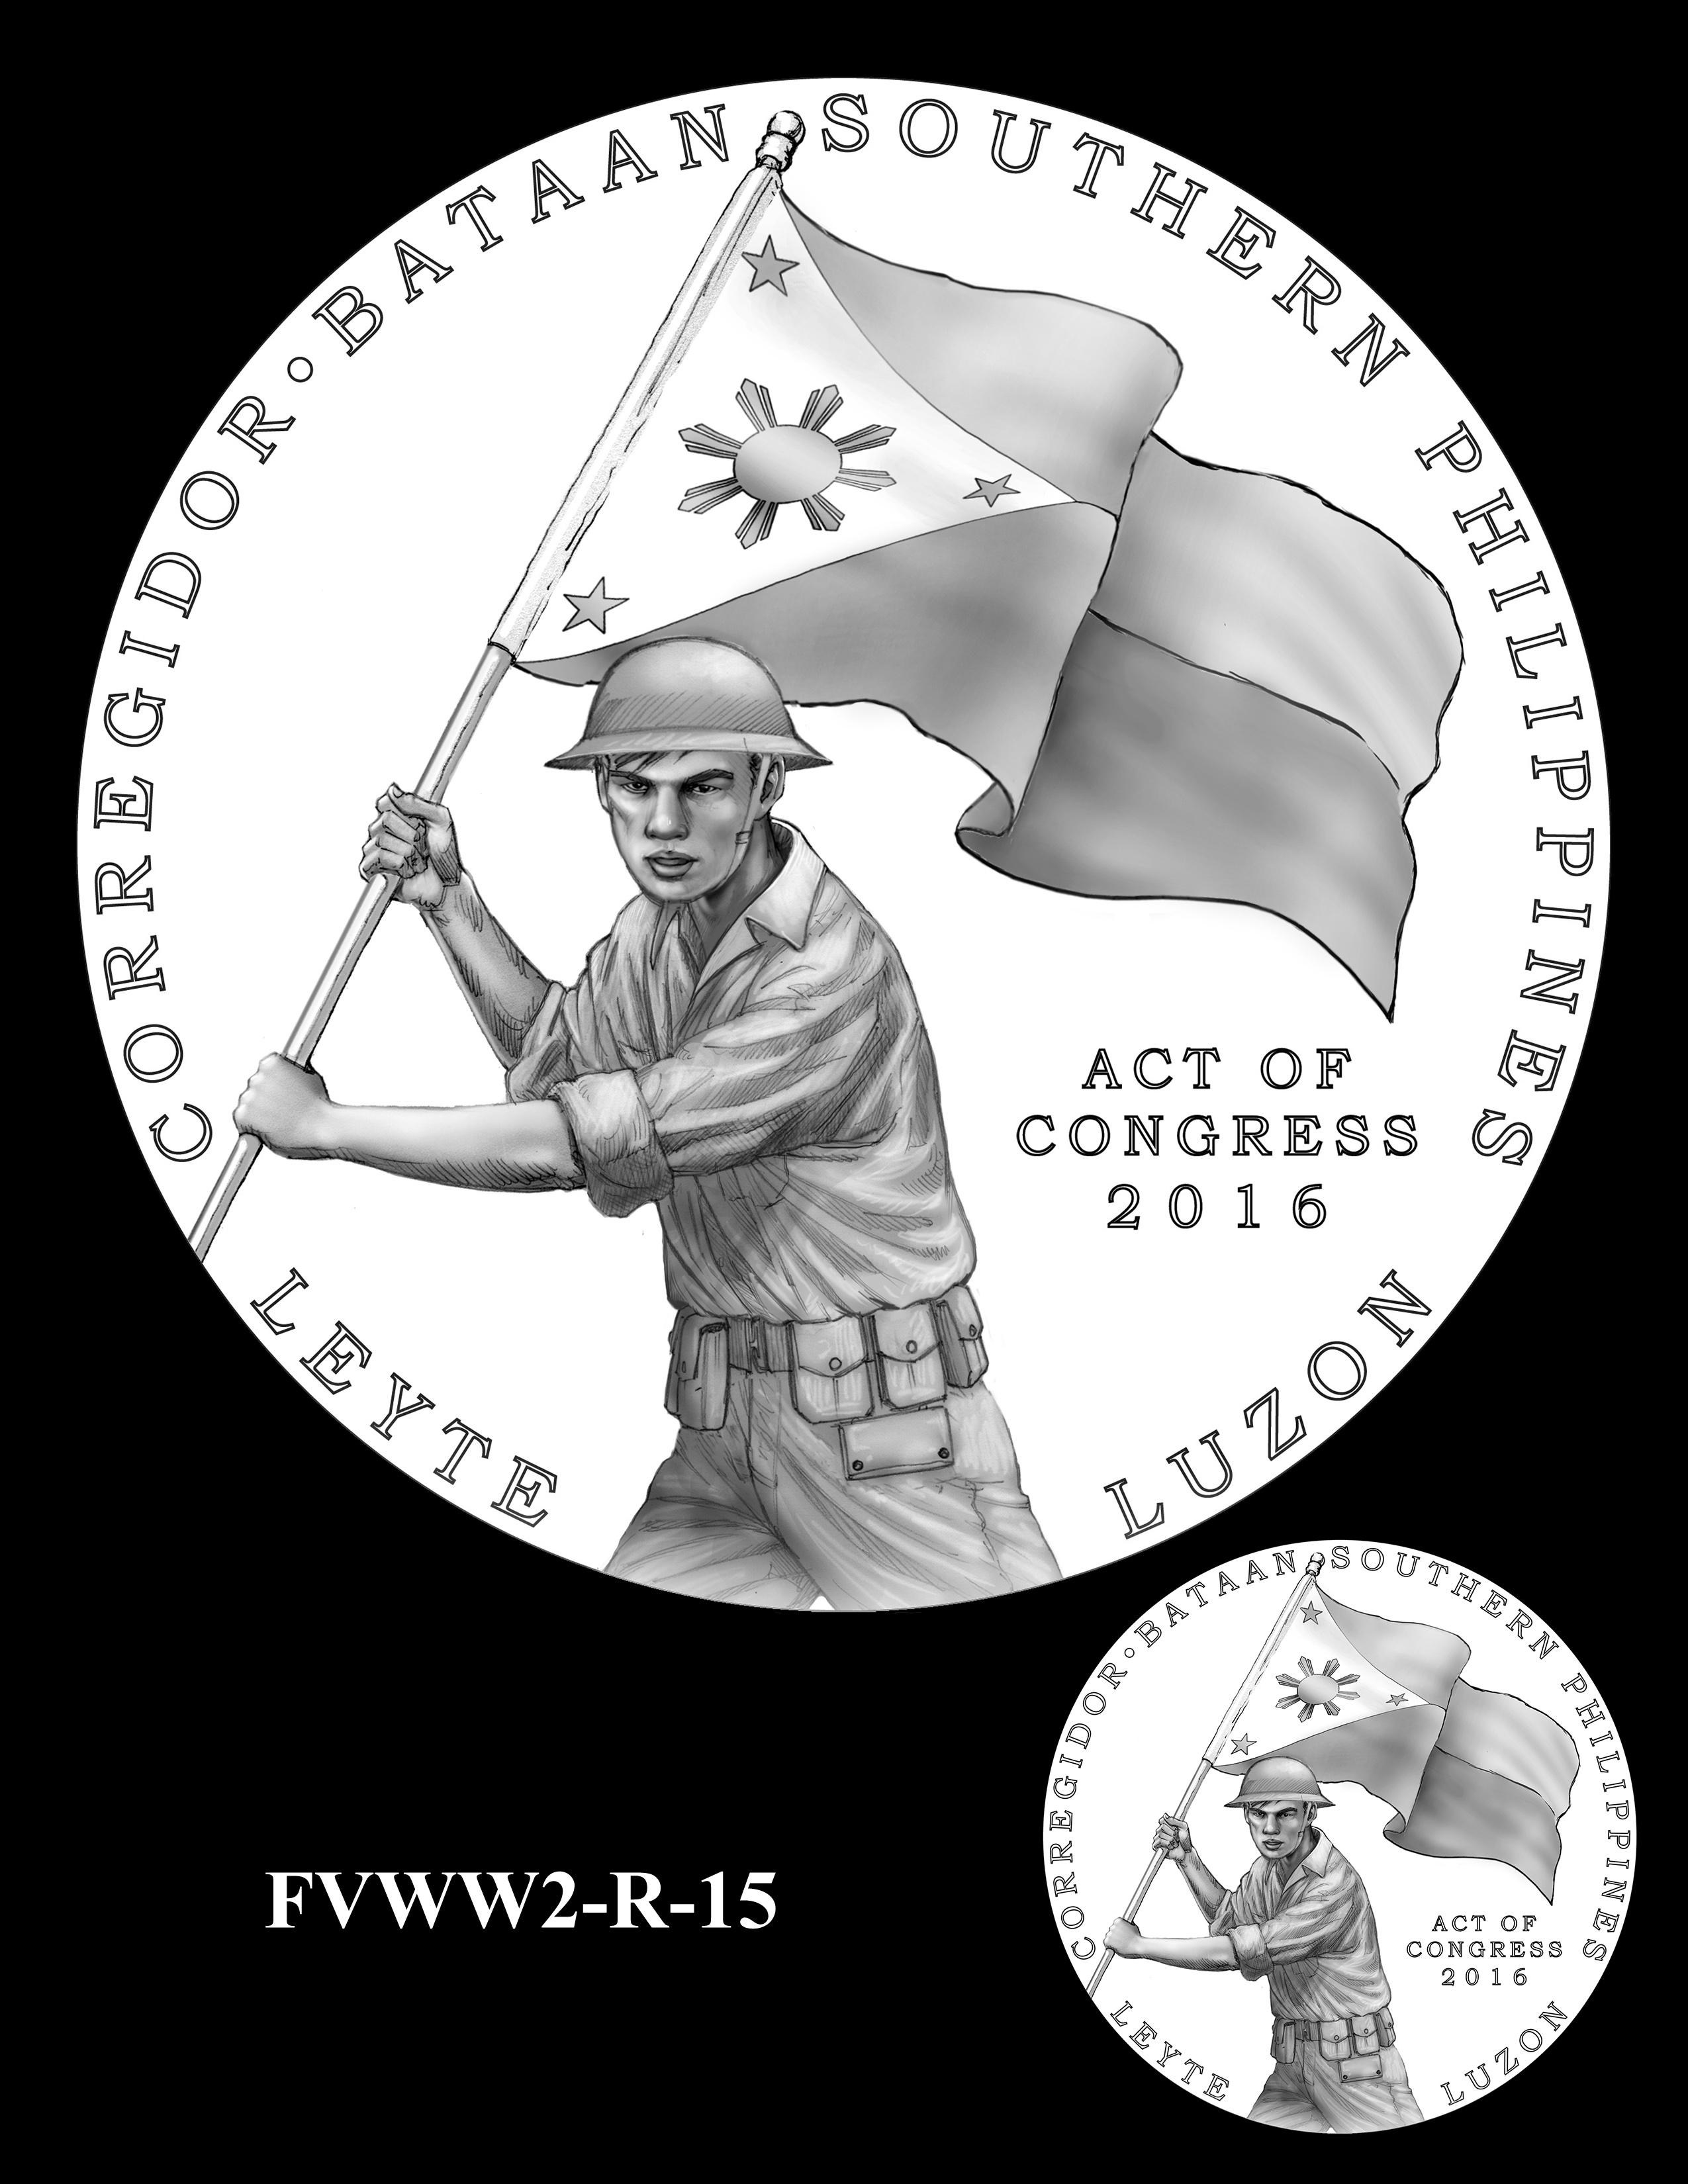 FVWW2-R-15 -- Filipino Veterans of World War II Congressional Gold Medal